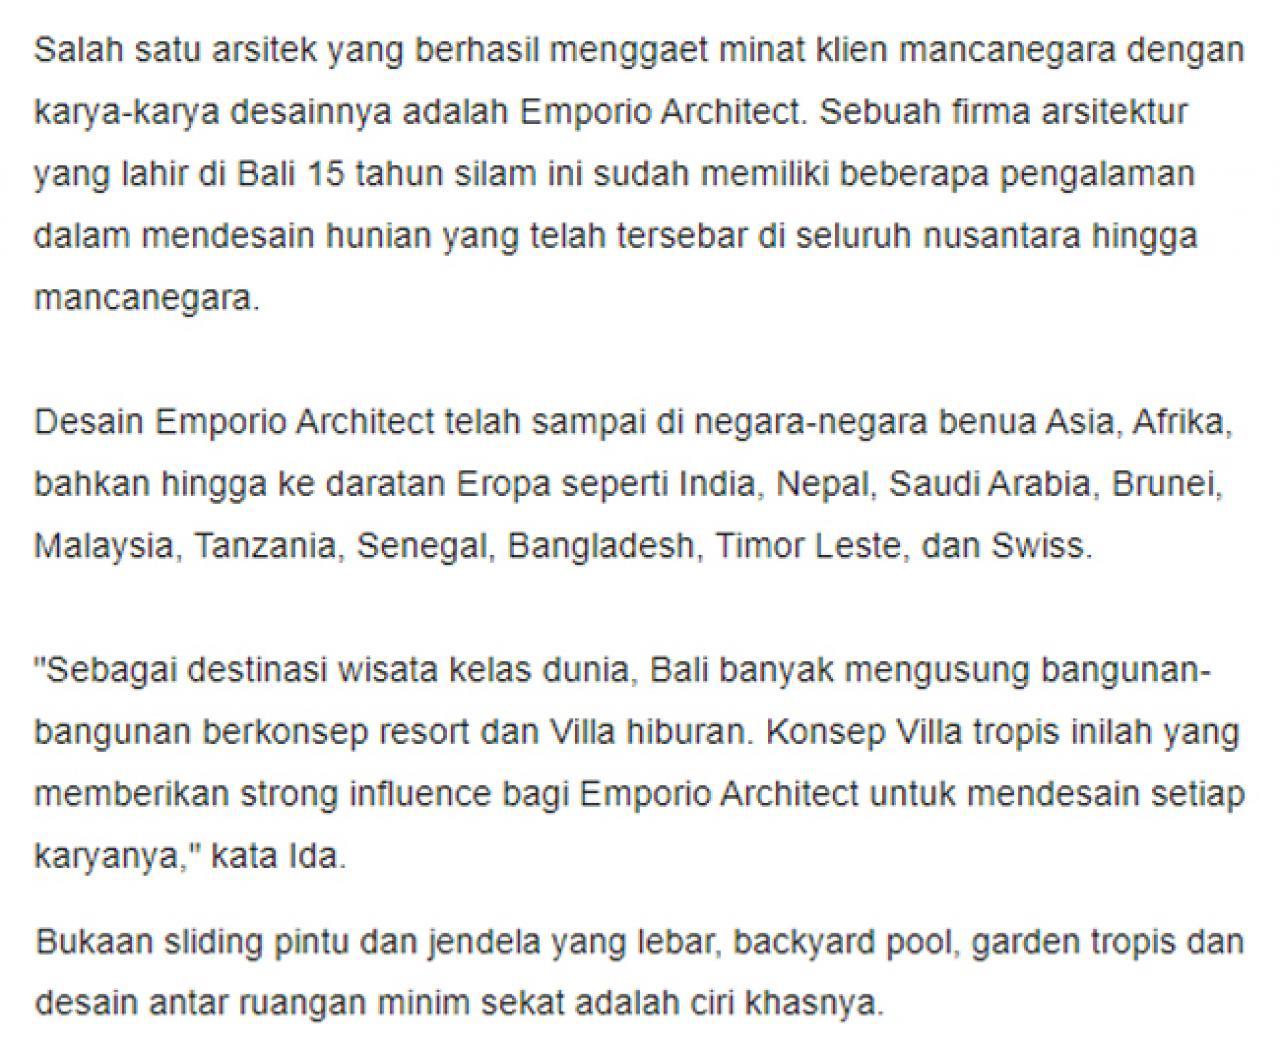 Ulasan Media SINDONEWS.com - Emporio Architect, Arsitek Anak Bangsa yang Berhasil Tembus Pasar Internasional 2 2